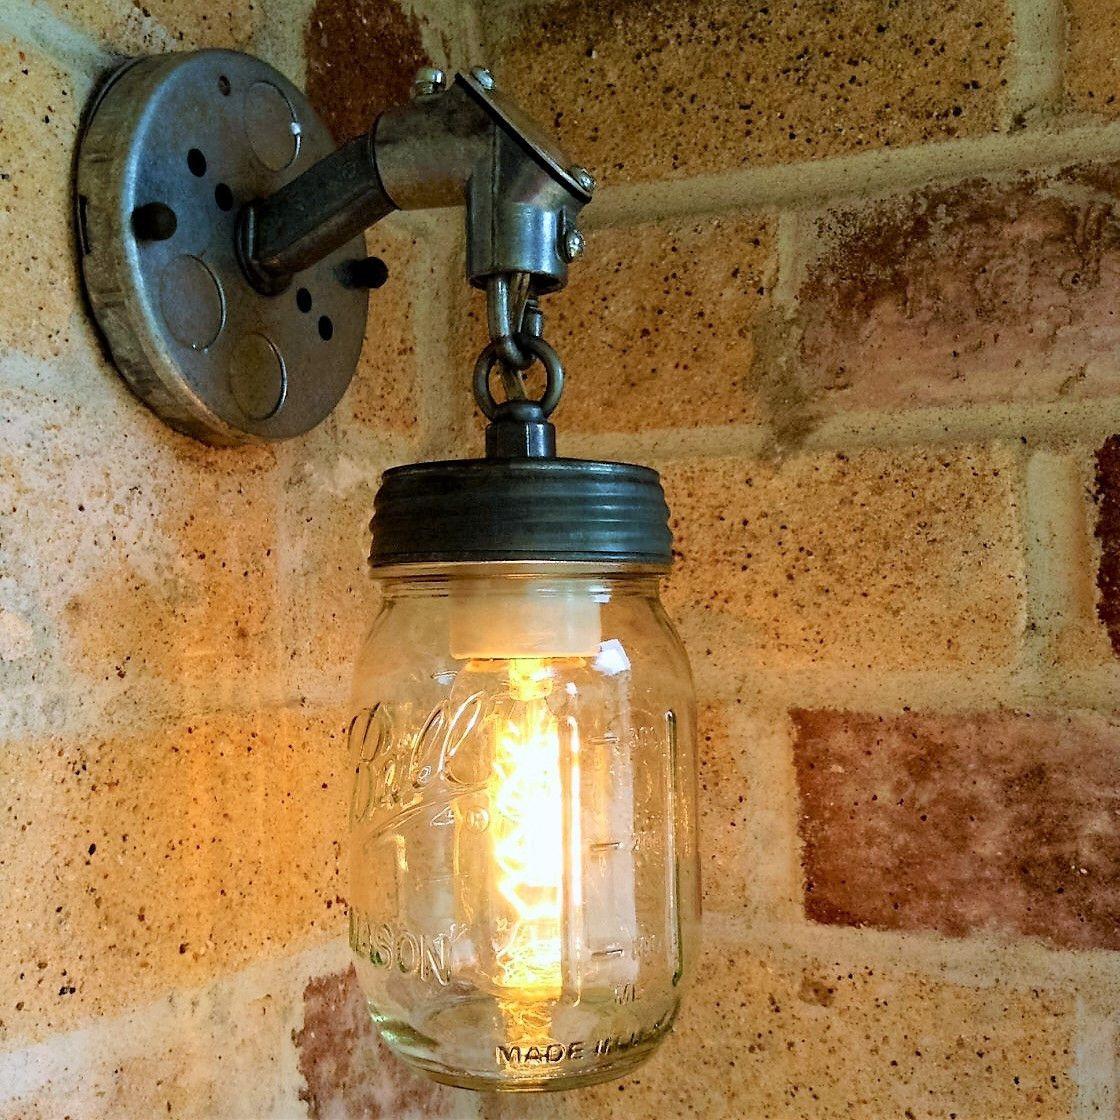 The Jar of Light Pint Mason Jar